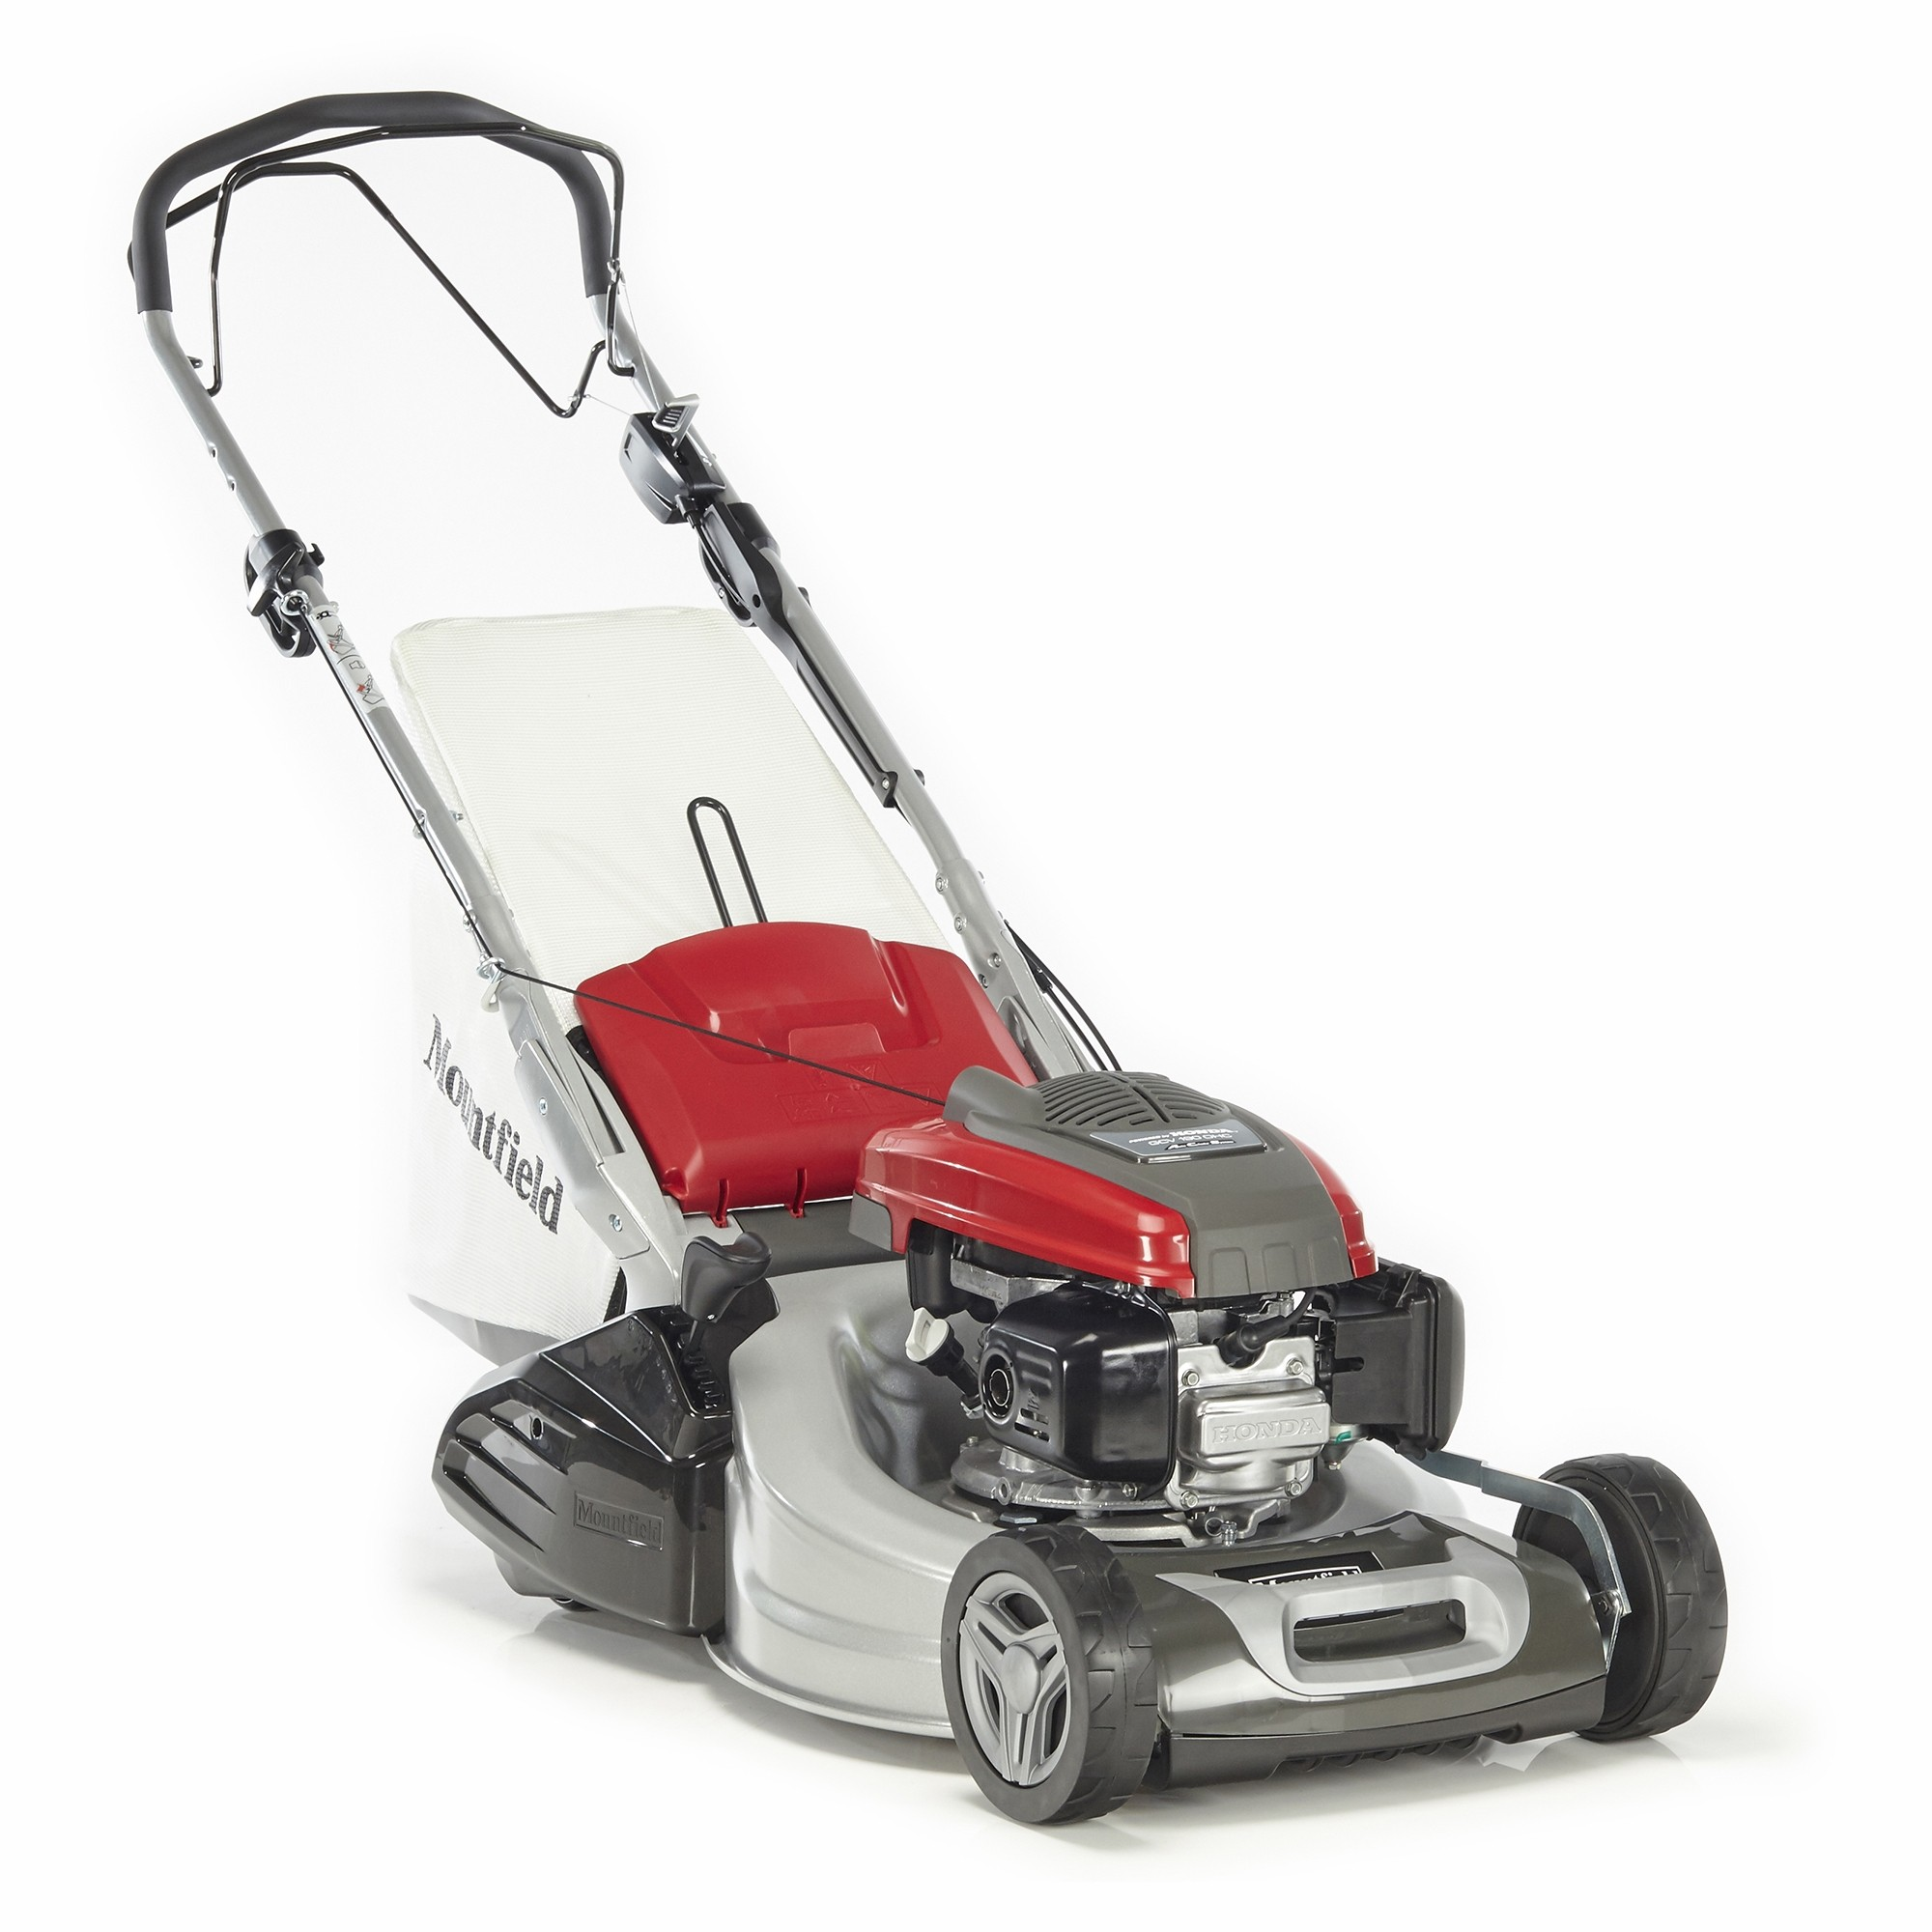 sp555r lawnmower